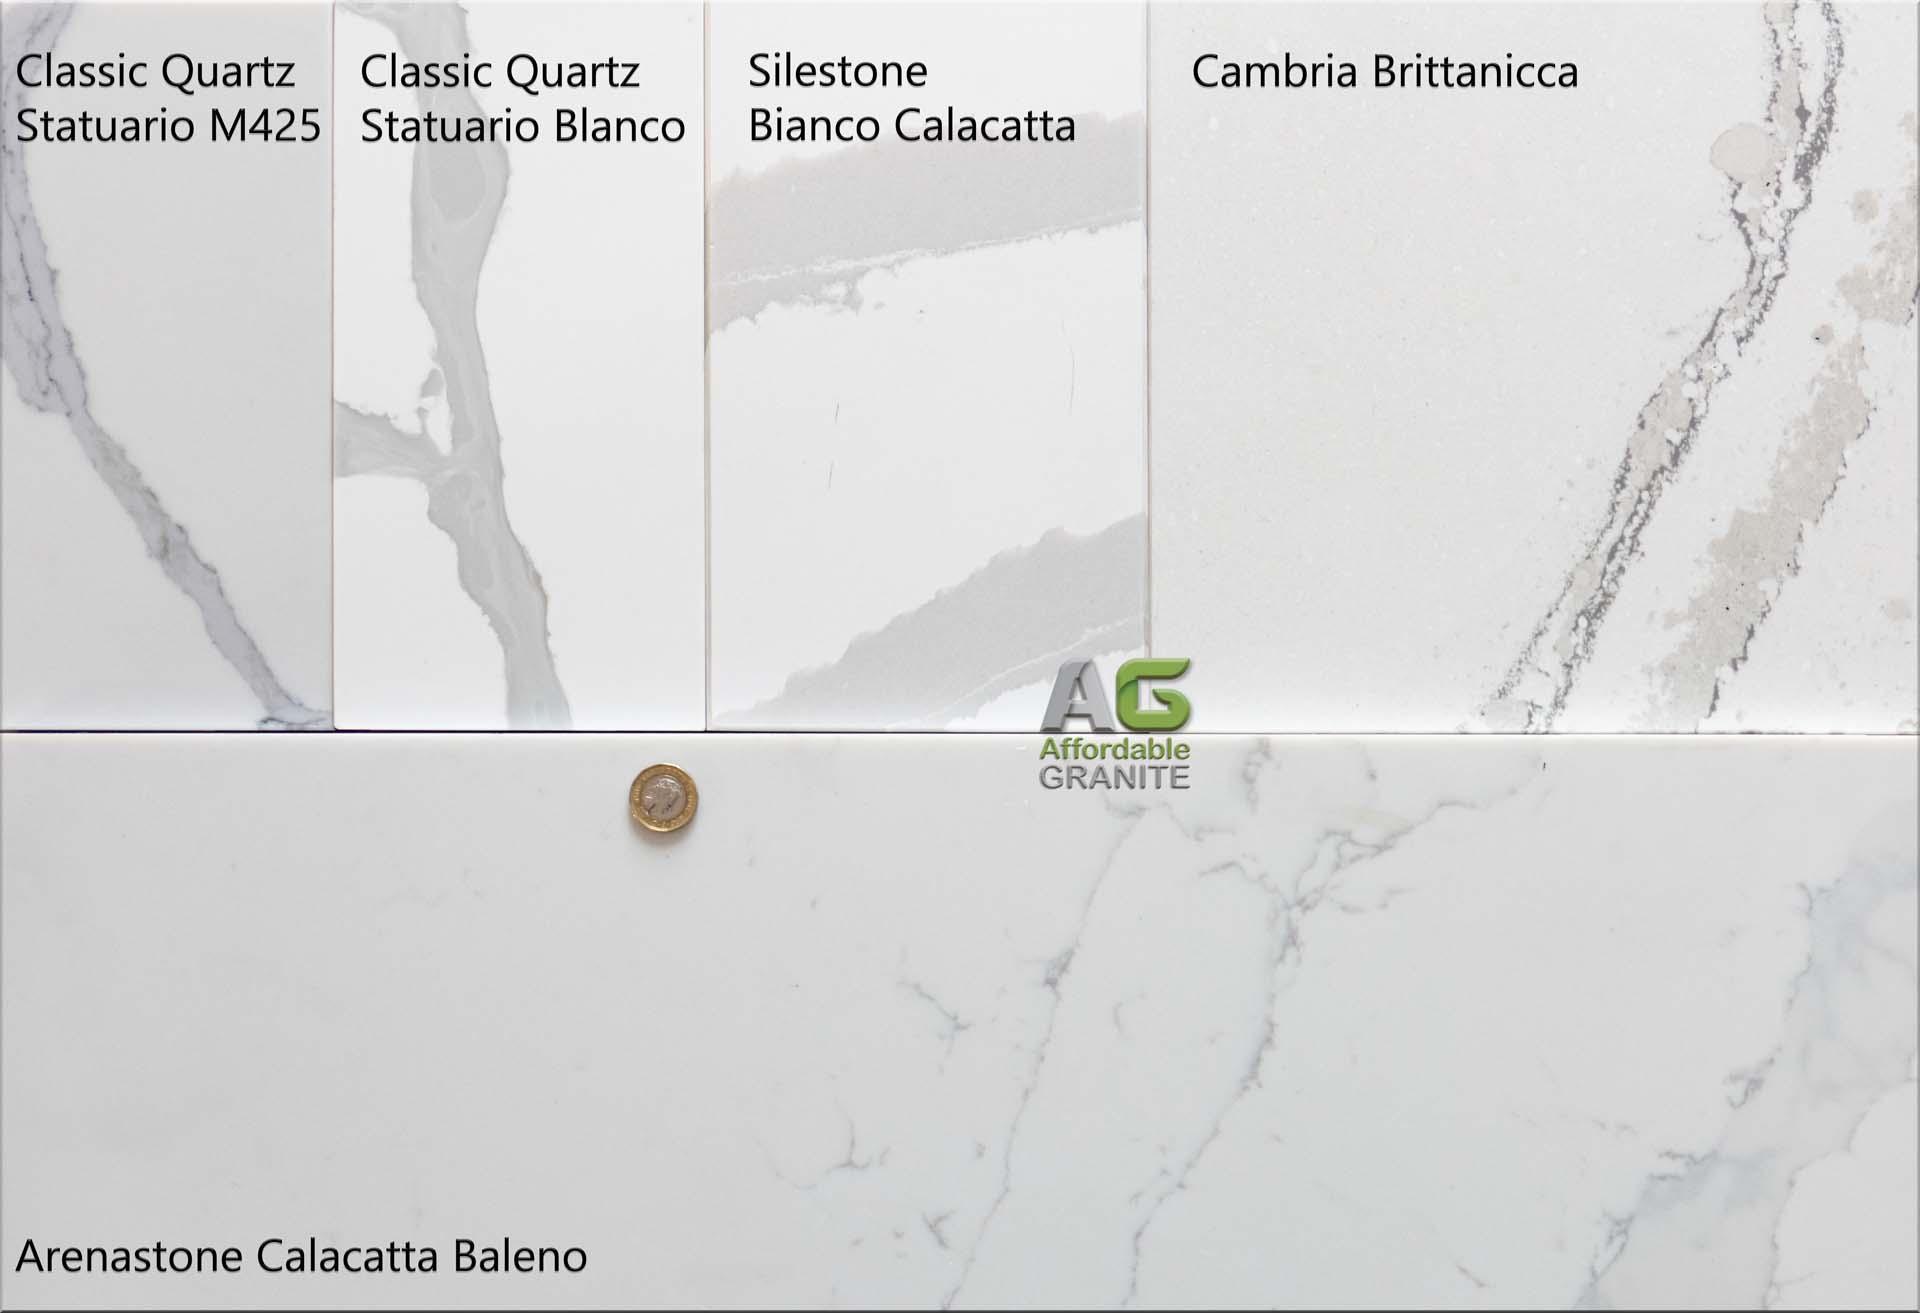 white marble quartz Silestone Calacatta Bianca Classic Quartz Statuario Blanco Cambria Brittanicca Arenastone Calacatta Baleno a